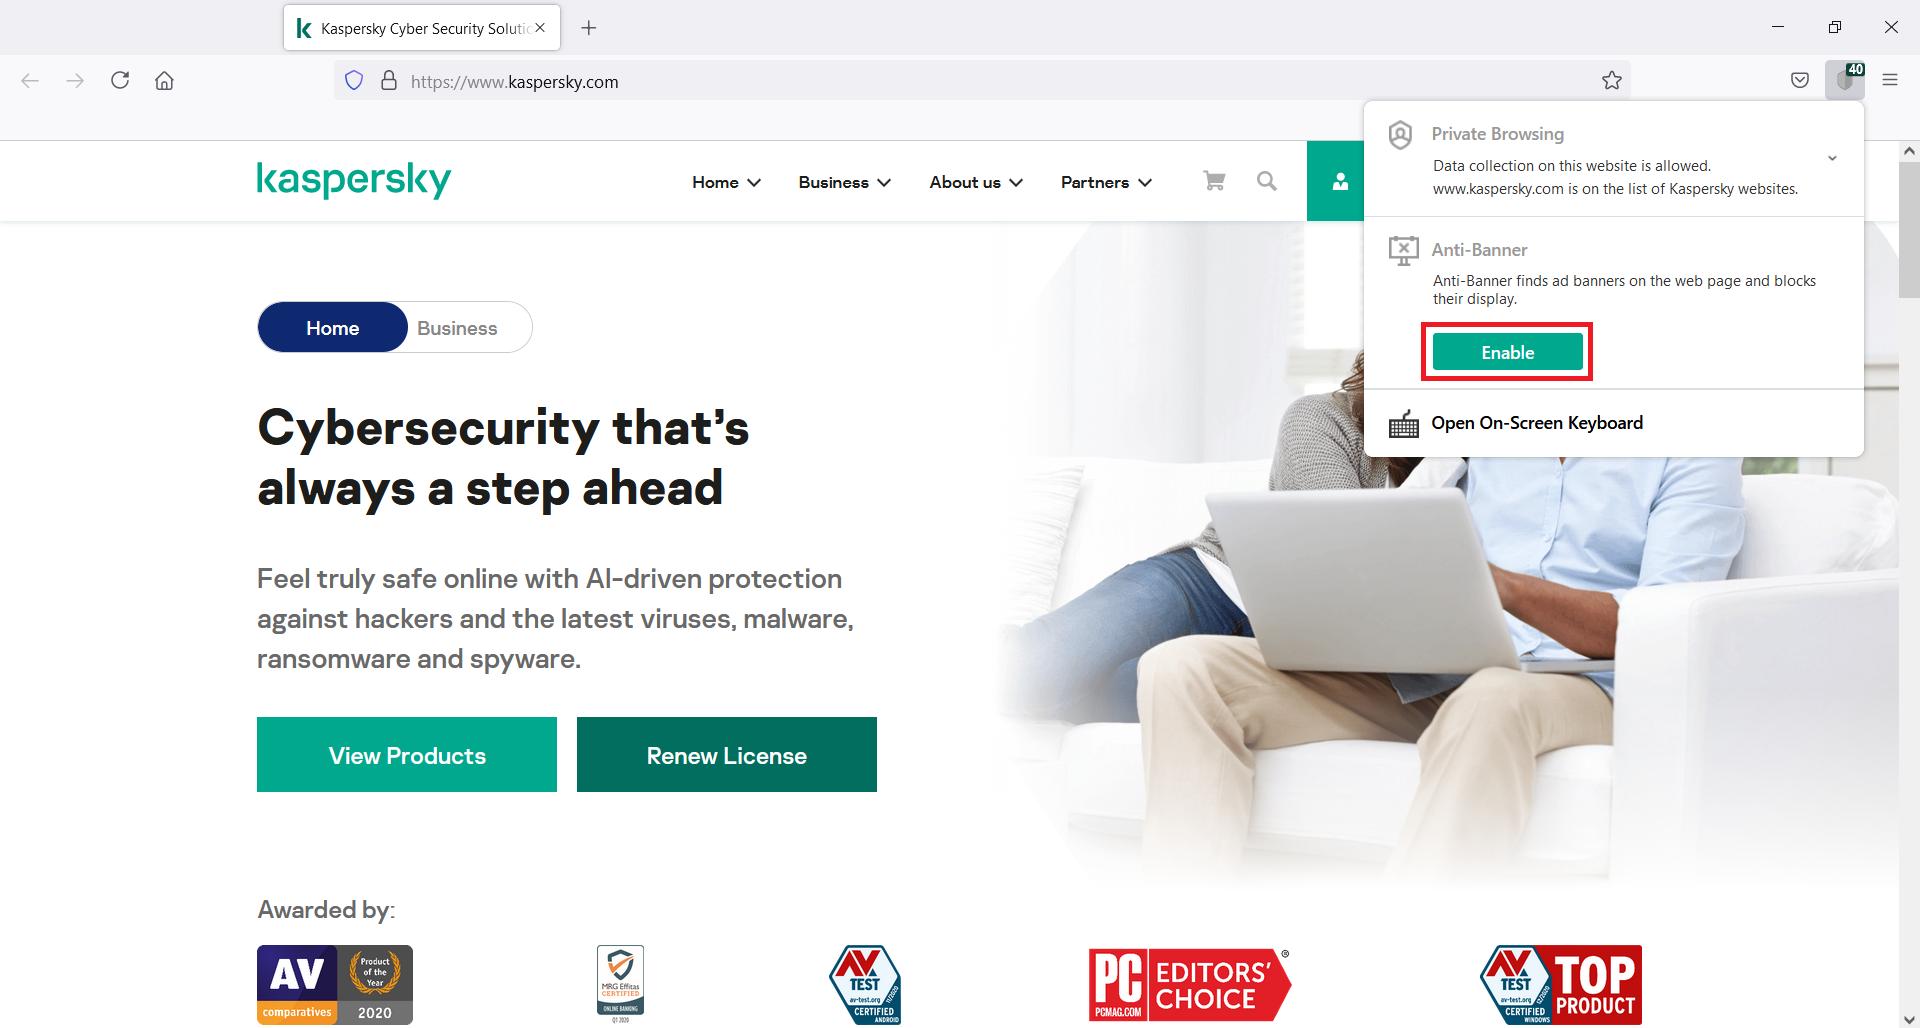 Enabling Anti-Banner in Kaspersky Security Cloud through the Kaspersky Protection extension menu